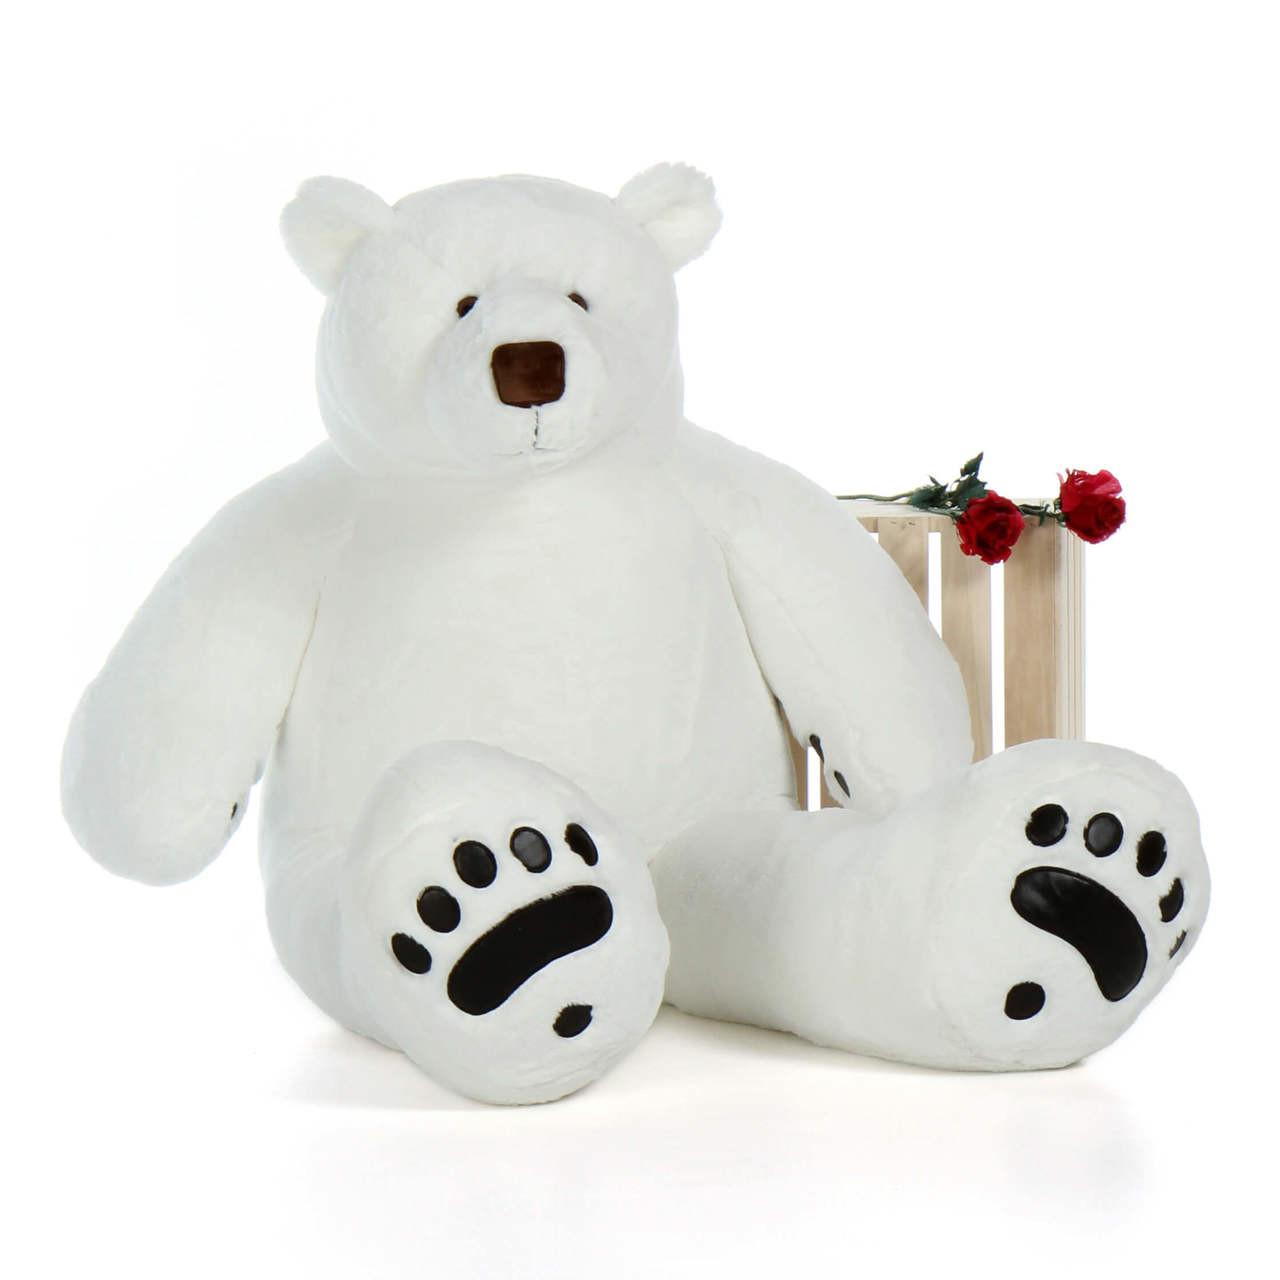 5 Foot Polar Bear Stuffed Animal Large